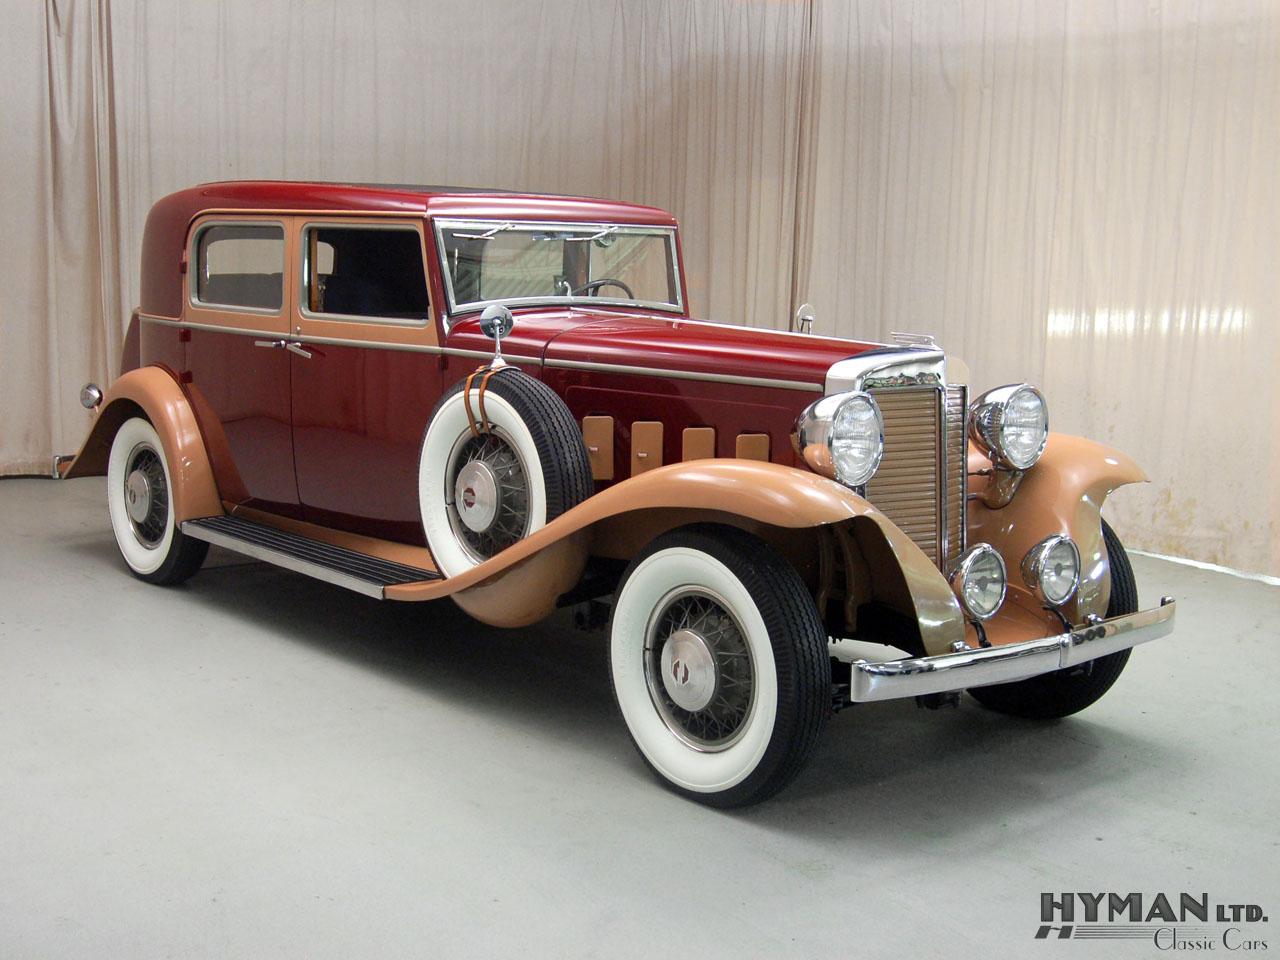 High Resolution Wallpaper   1931 Marmon Sixteen 4 Door Convertible Sedan By LeBaron 1280x960 px